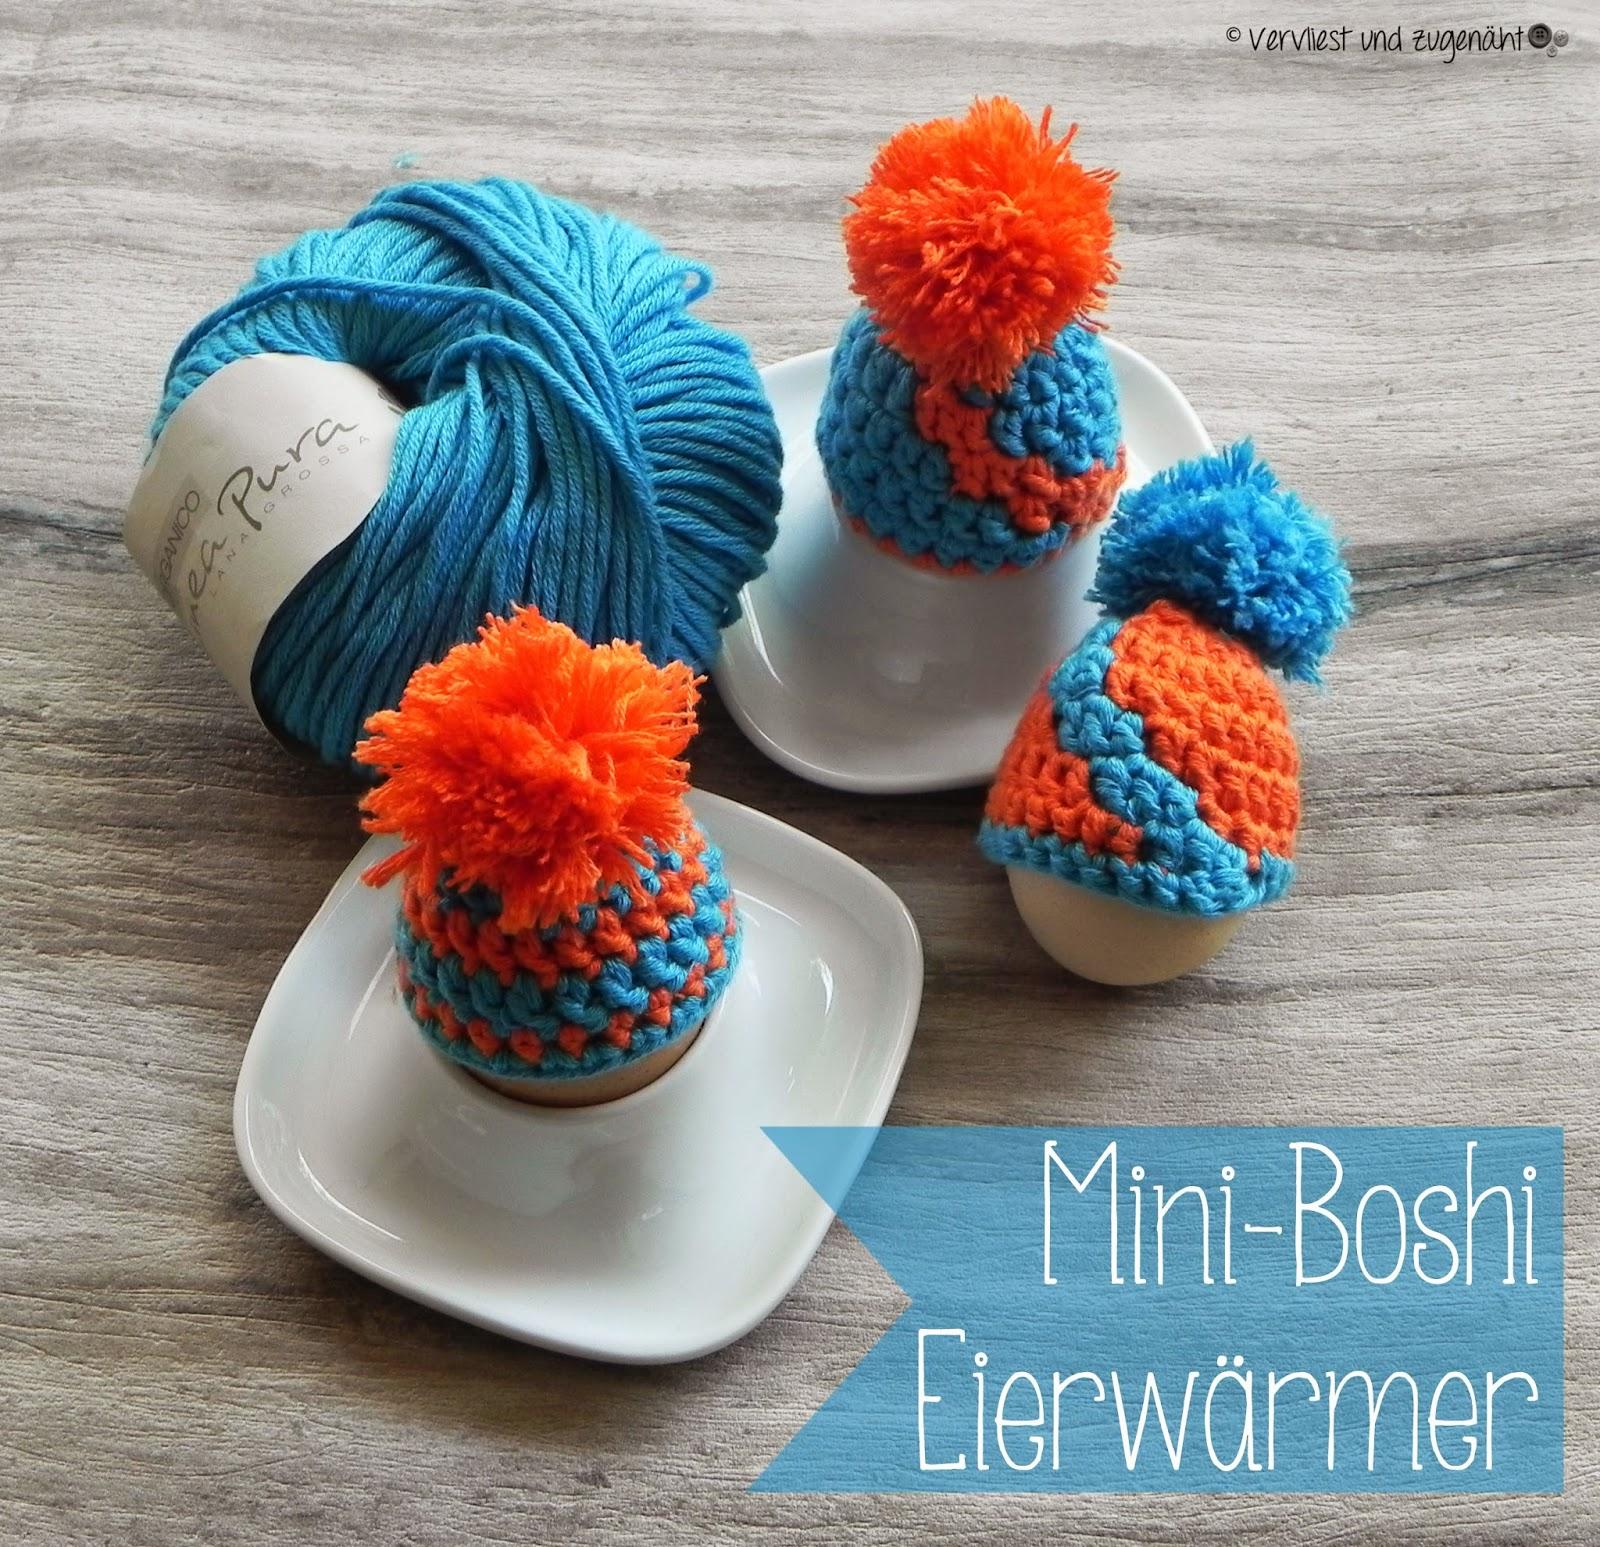 http://vervliestundzugenaeht.blogspot.de/2014/04/mini-boshi-gehakelte-eierwarmer-tutorial.html